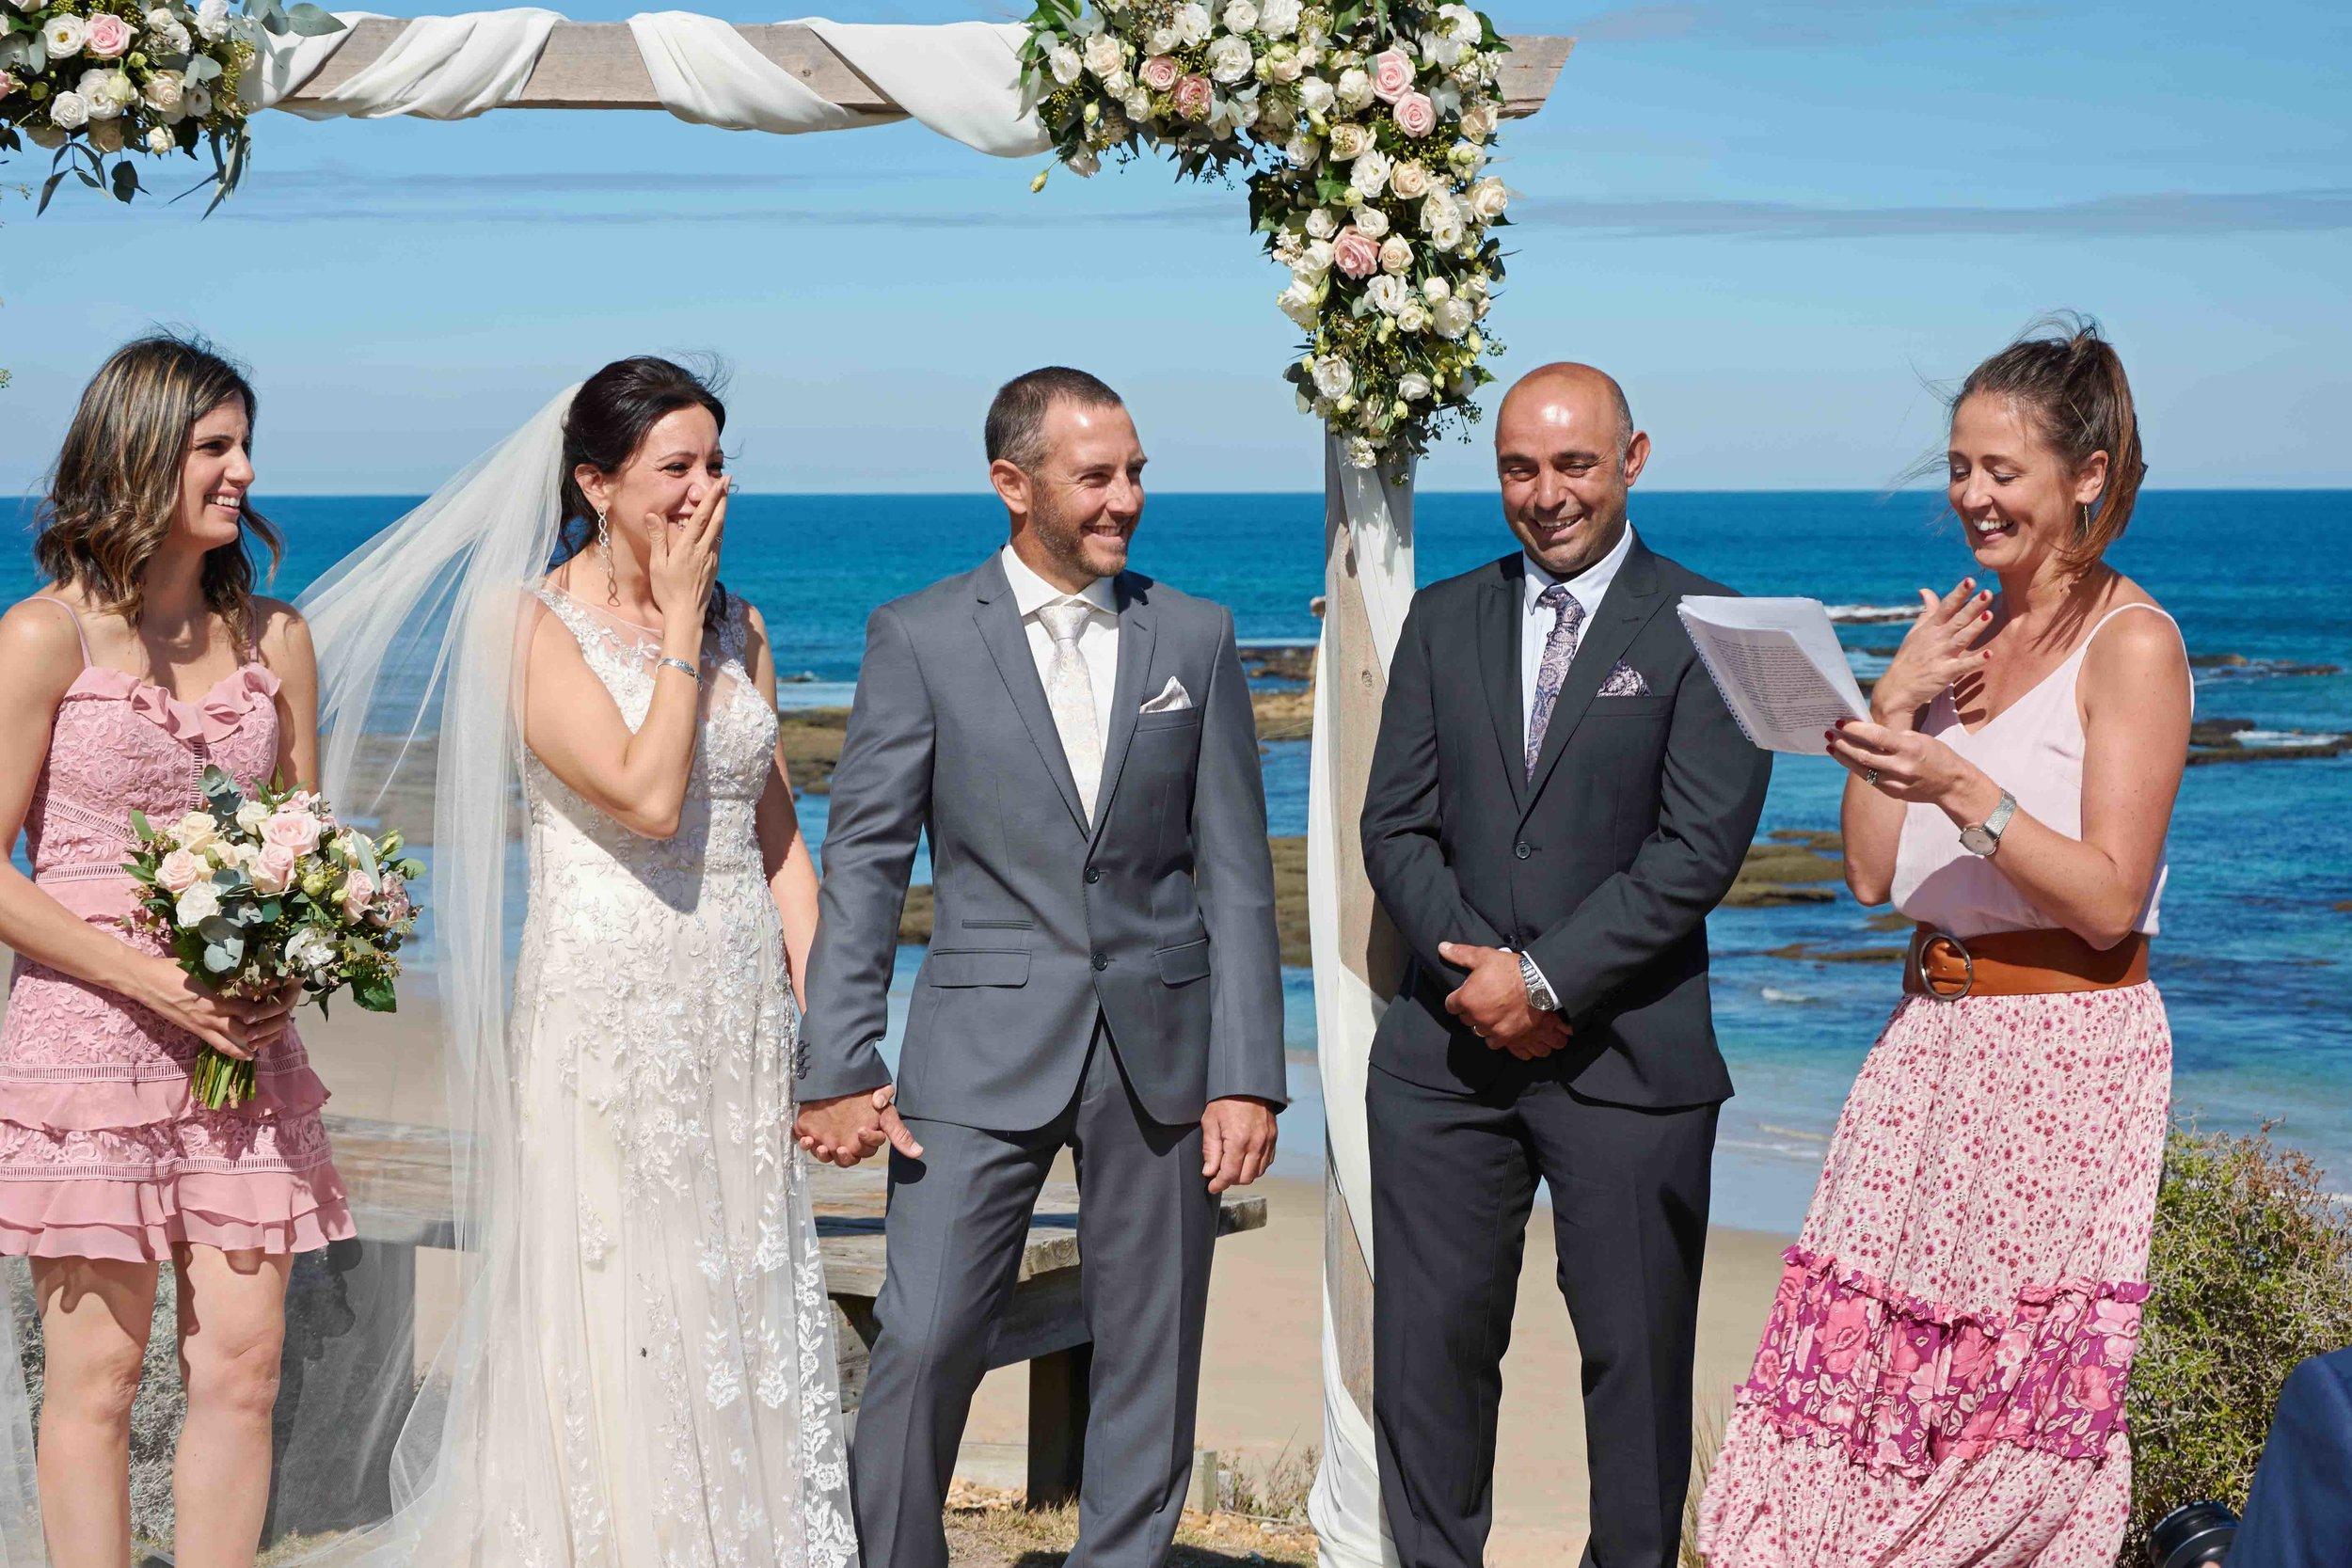 sorrento-wedding-photography-all-smiles-marissa-jade-photography-46.jpg